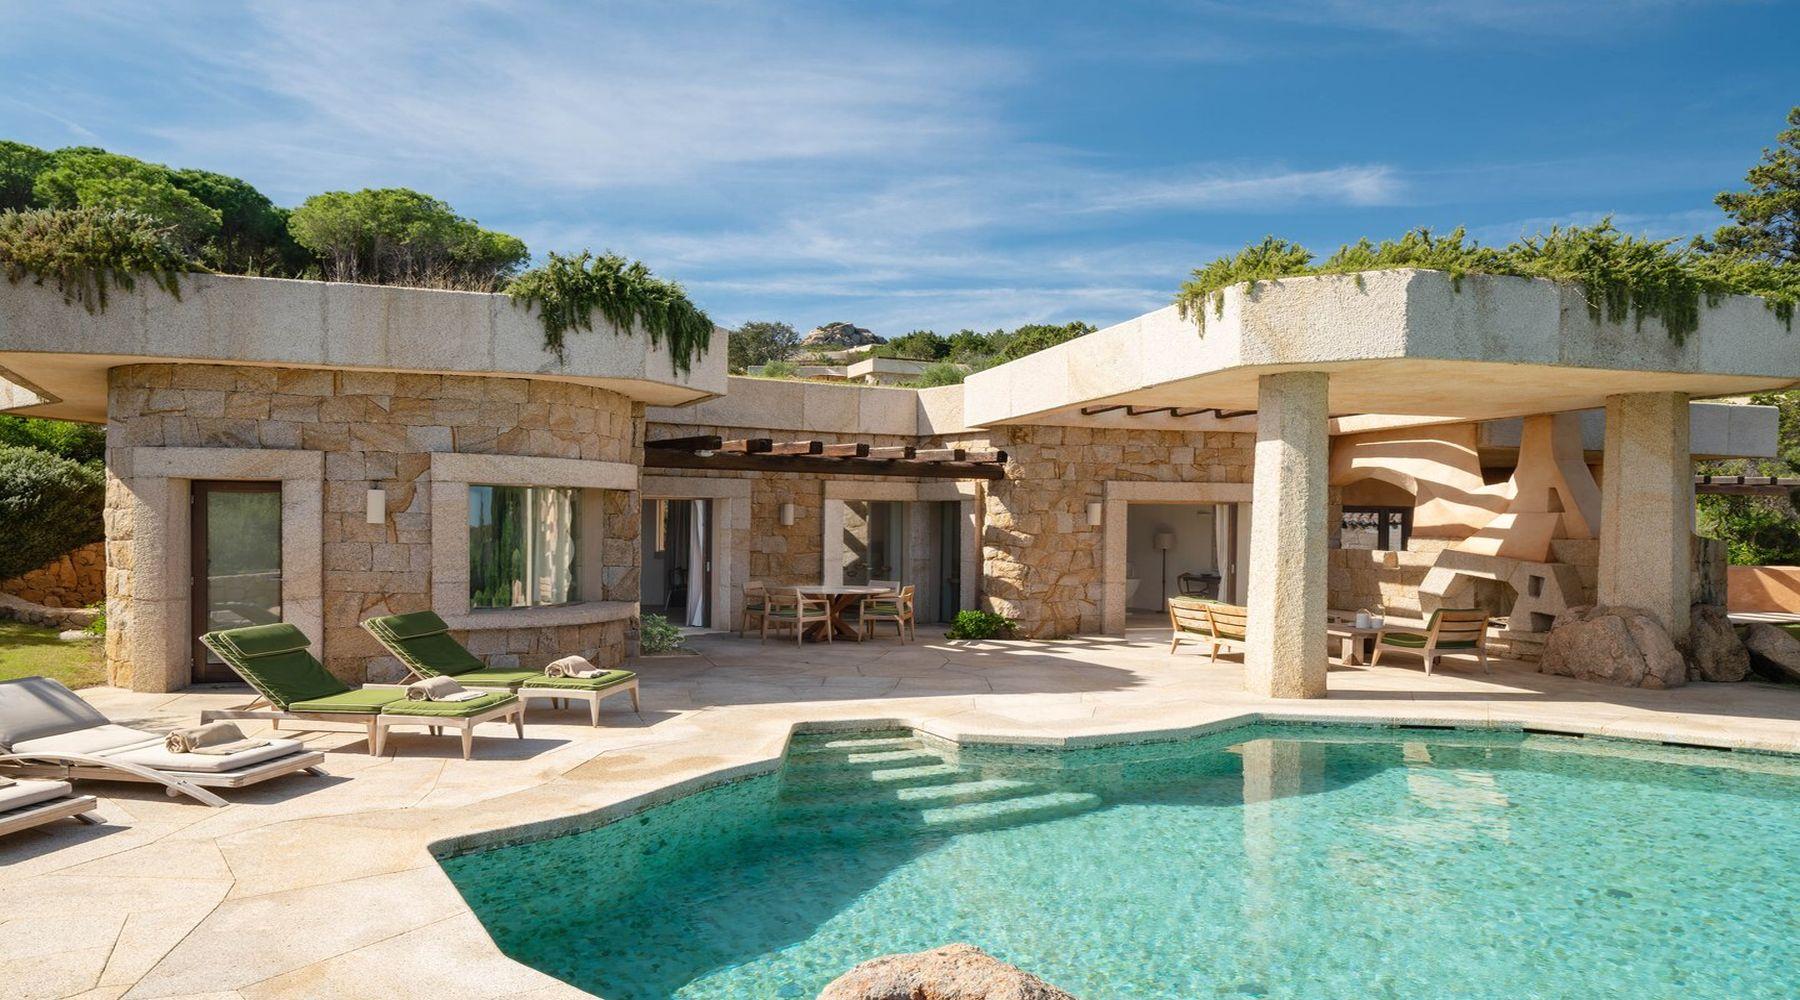 Hotel Pitrizza, a Luxury Collection Hotel, Costa Smeralda, Sarynia